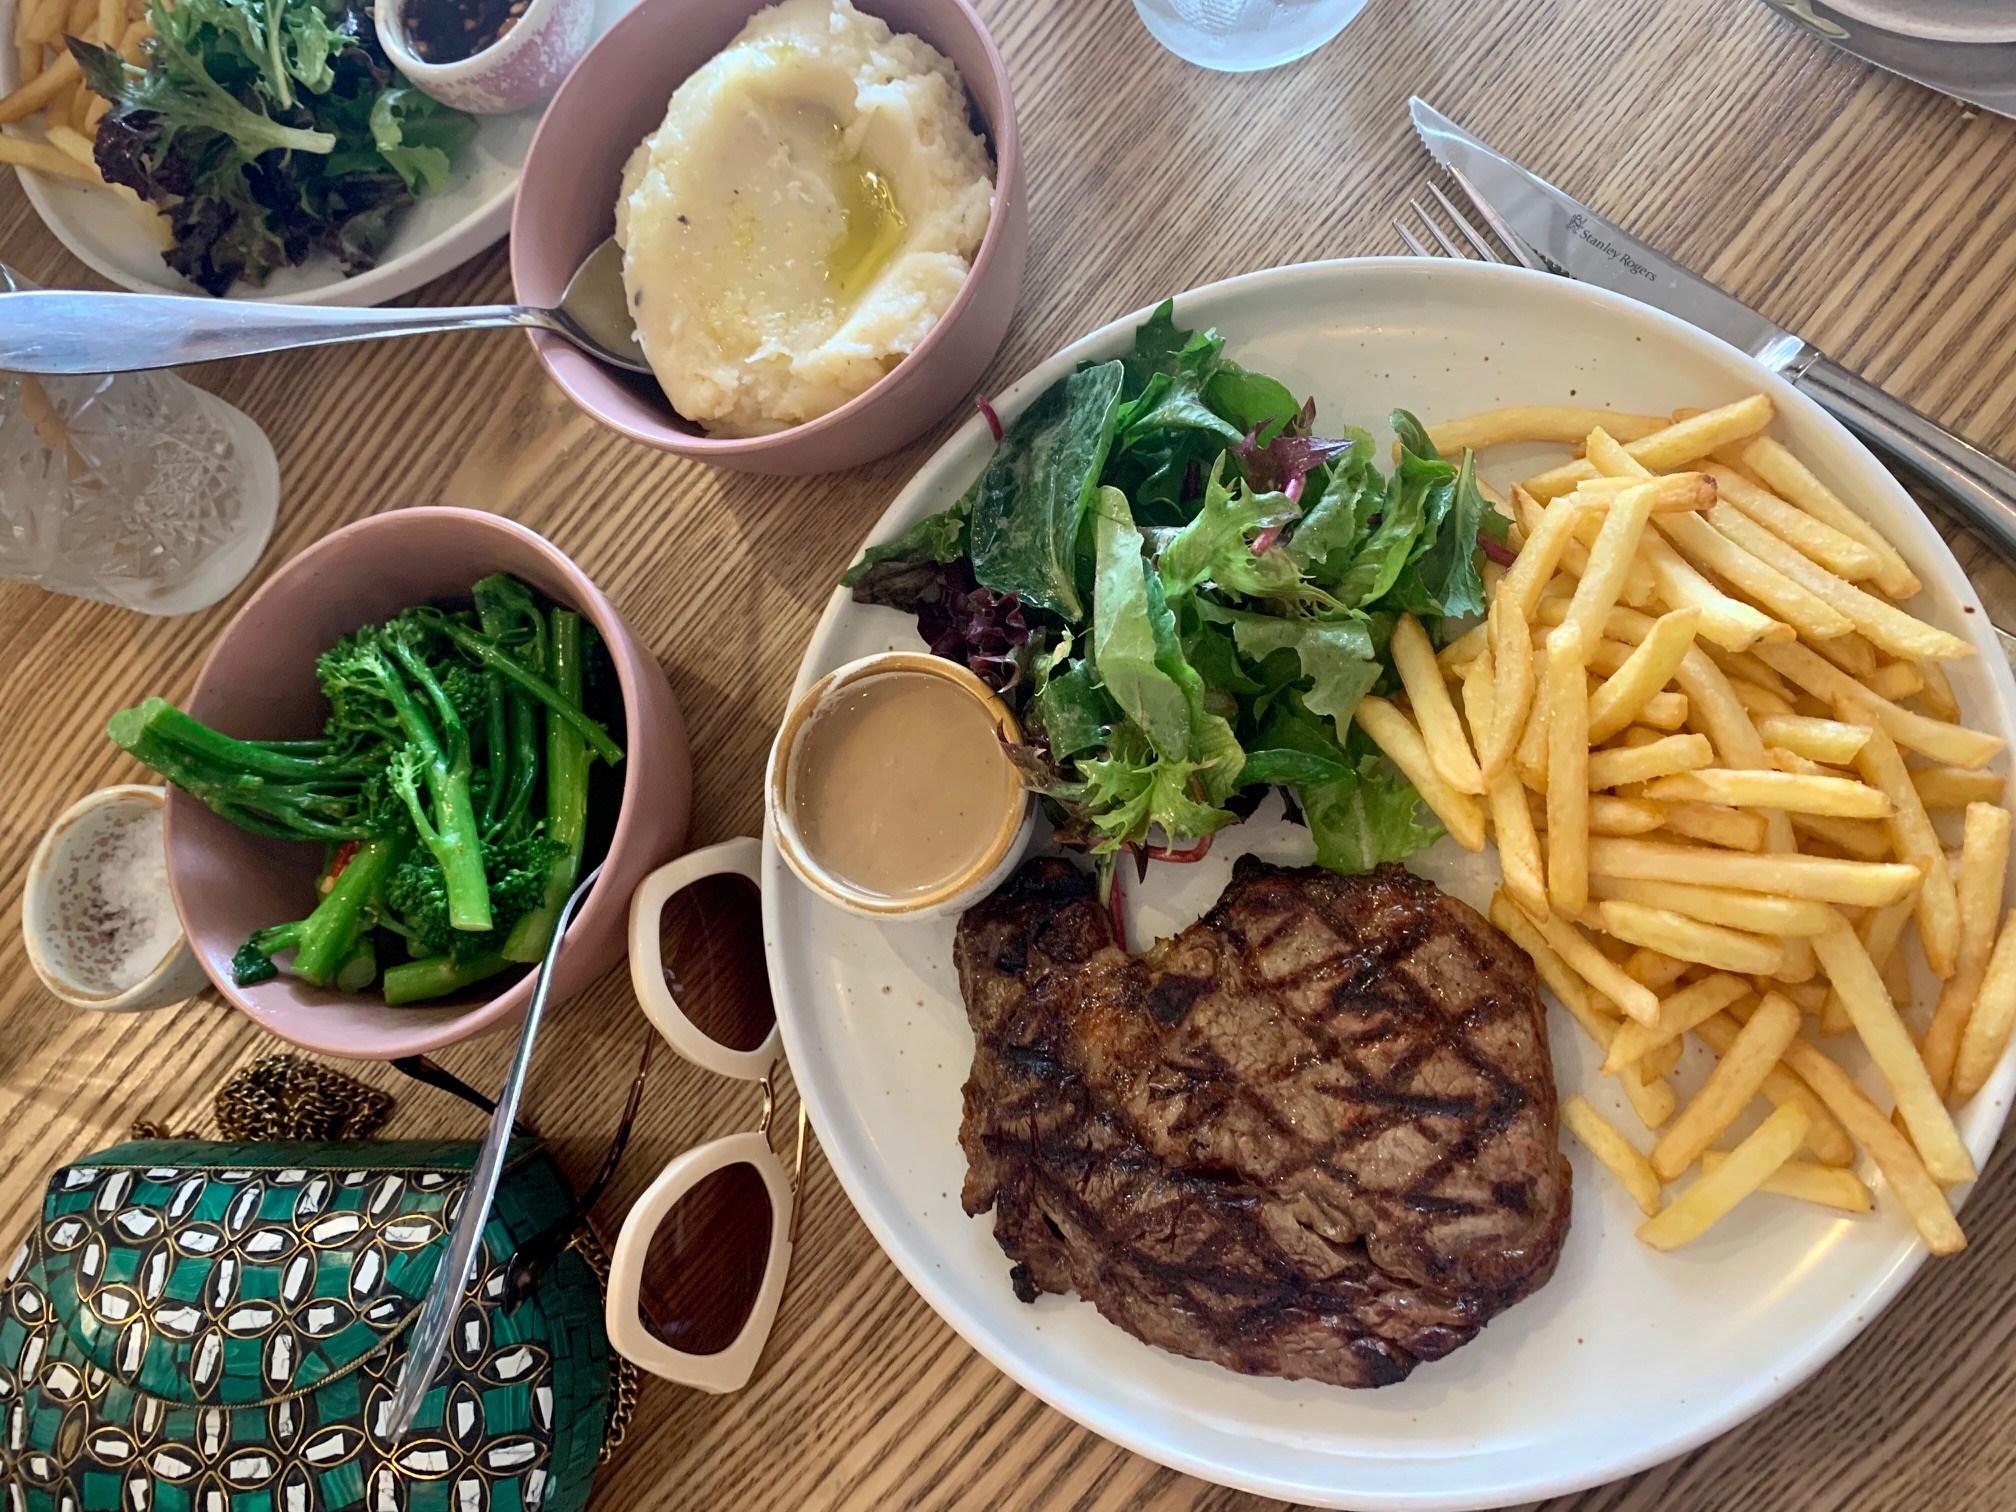 Delicious steak at Bakehouse Steakhouse, Ipswich